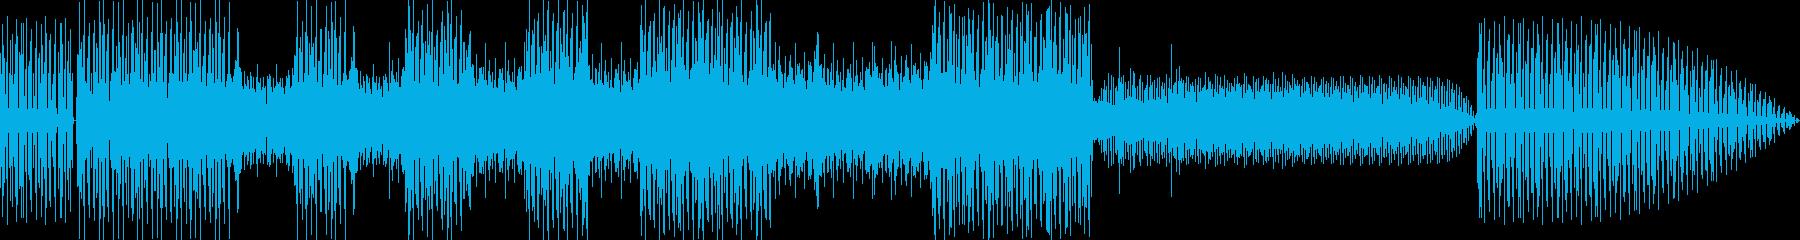 Electro、Instrumen...の再生済みの波形